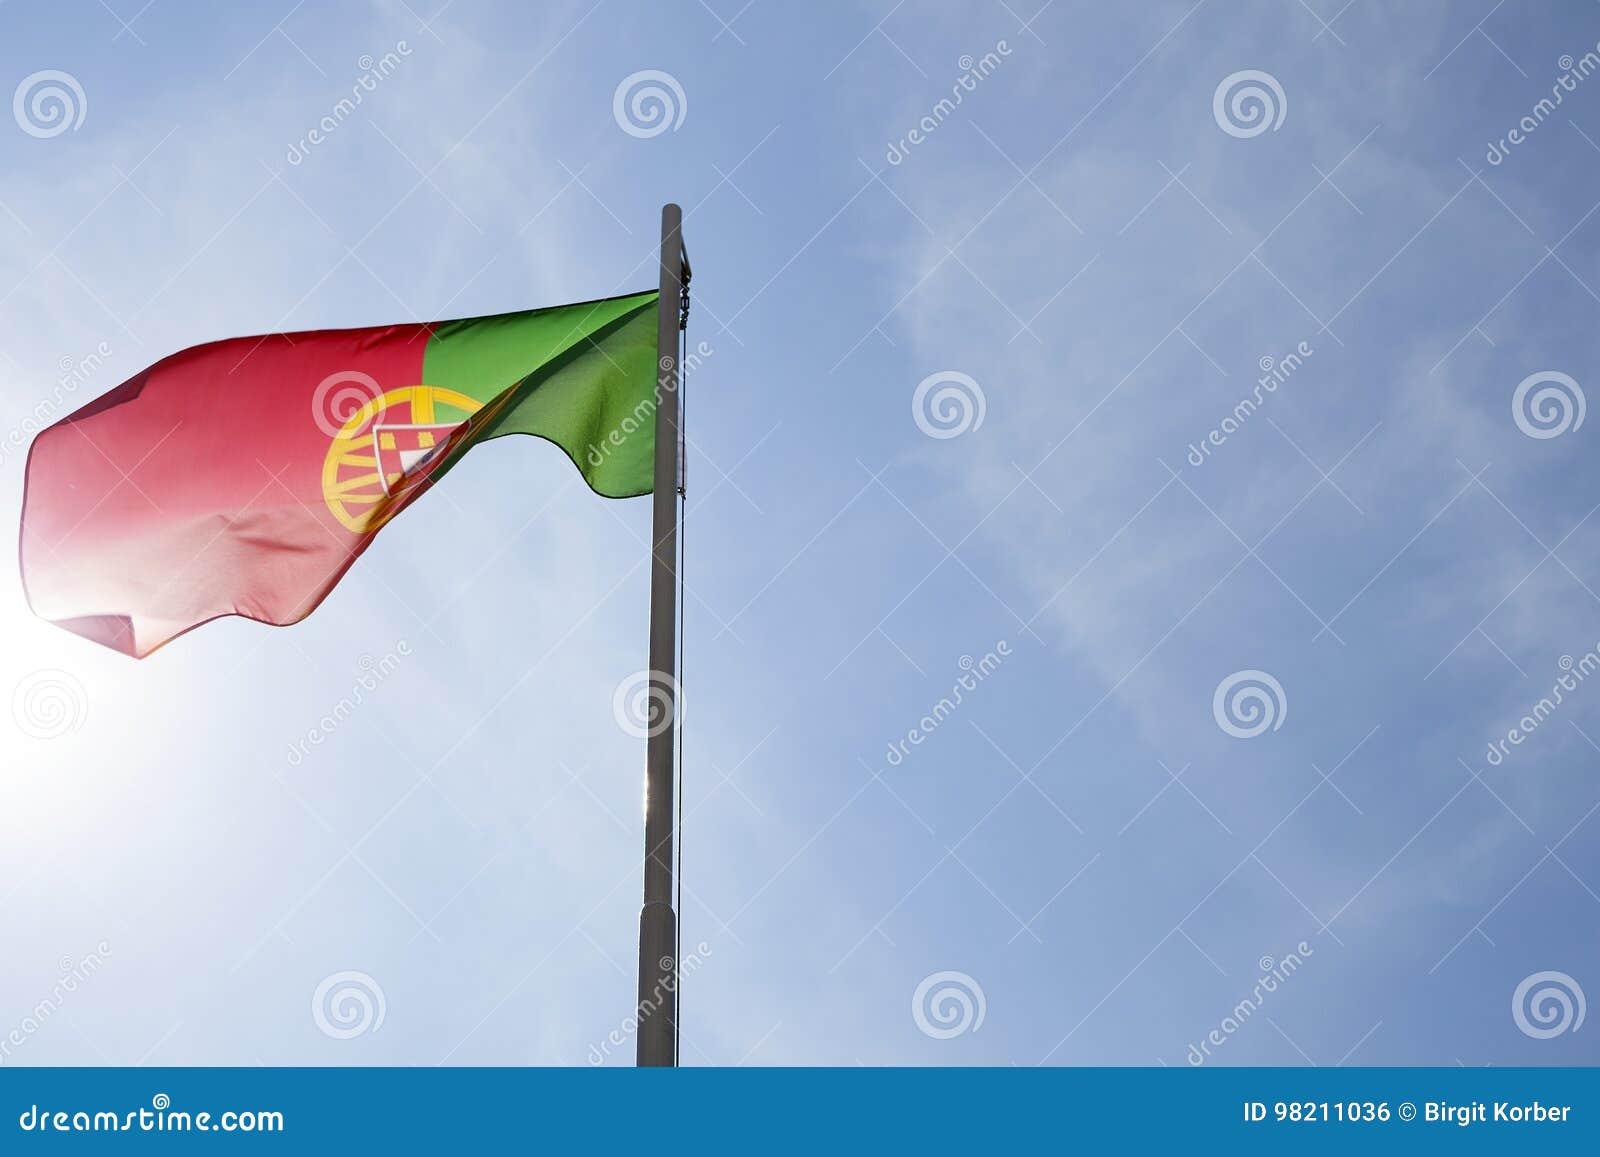 Flaga państowowa Portugalia na flagpole